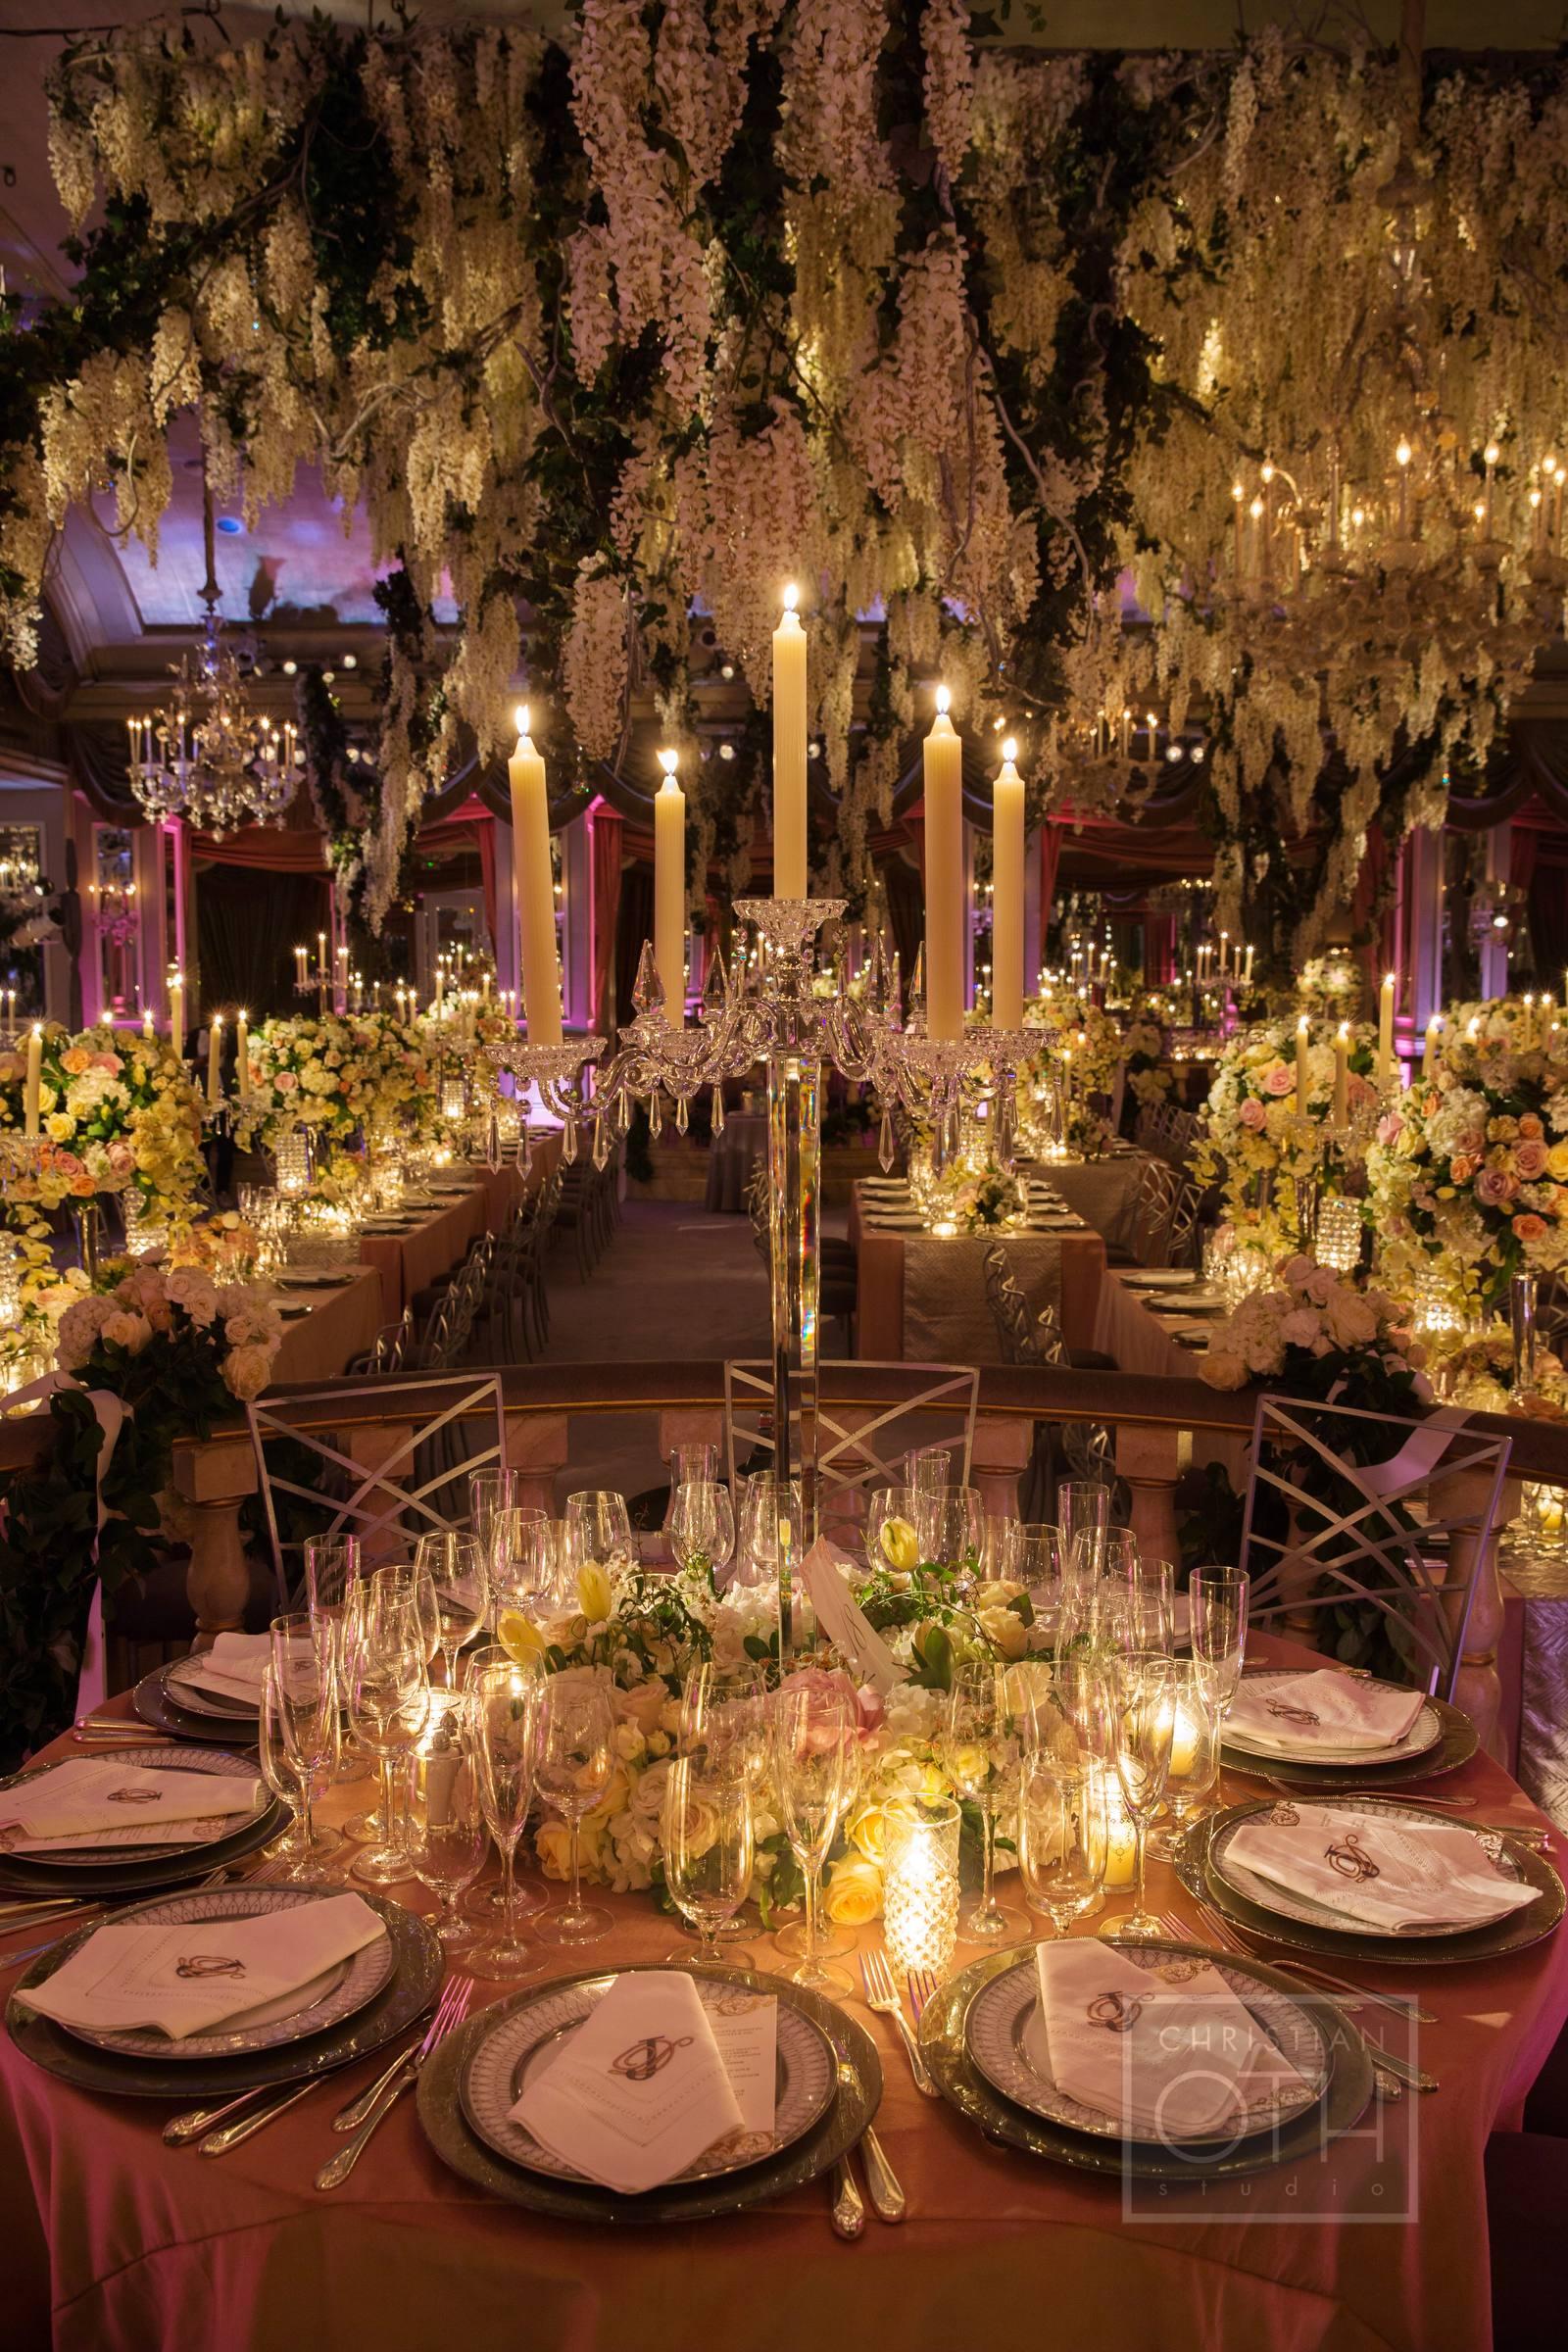 Ceci_New_York_Custom_Invitation_Pierre__City_ Destination_Wedding_Luxury_Personalized_Ceci_Style_Bride_Rose_Gold_Foil_Stamping197.JPG